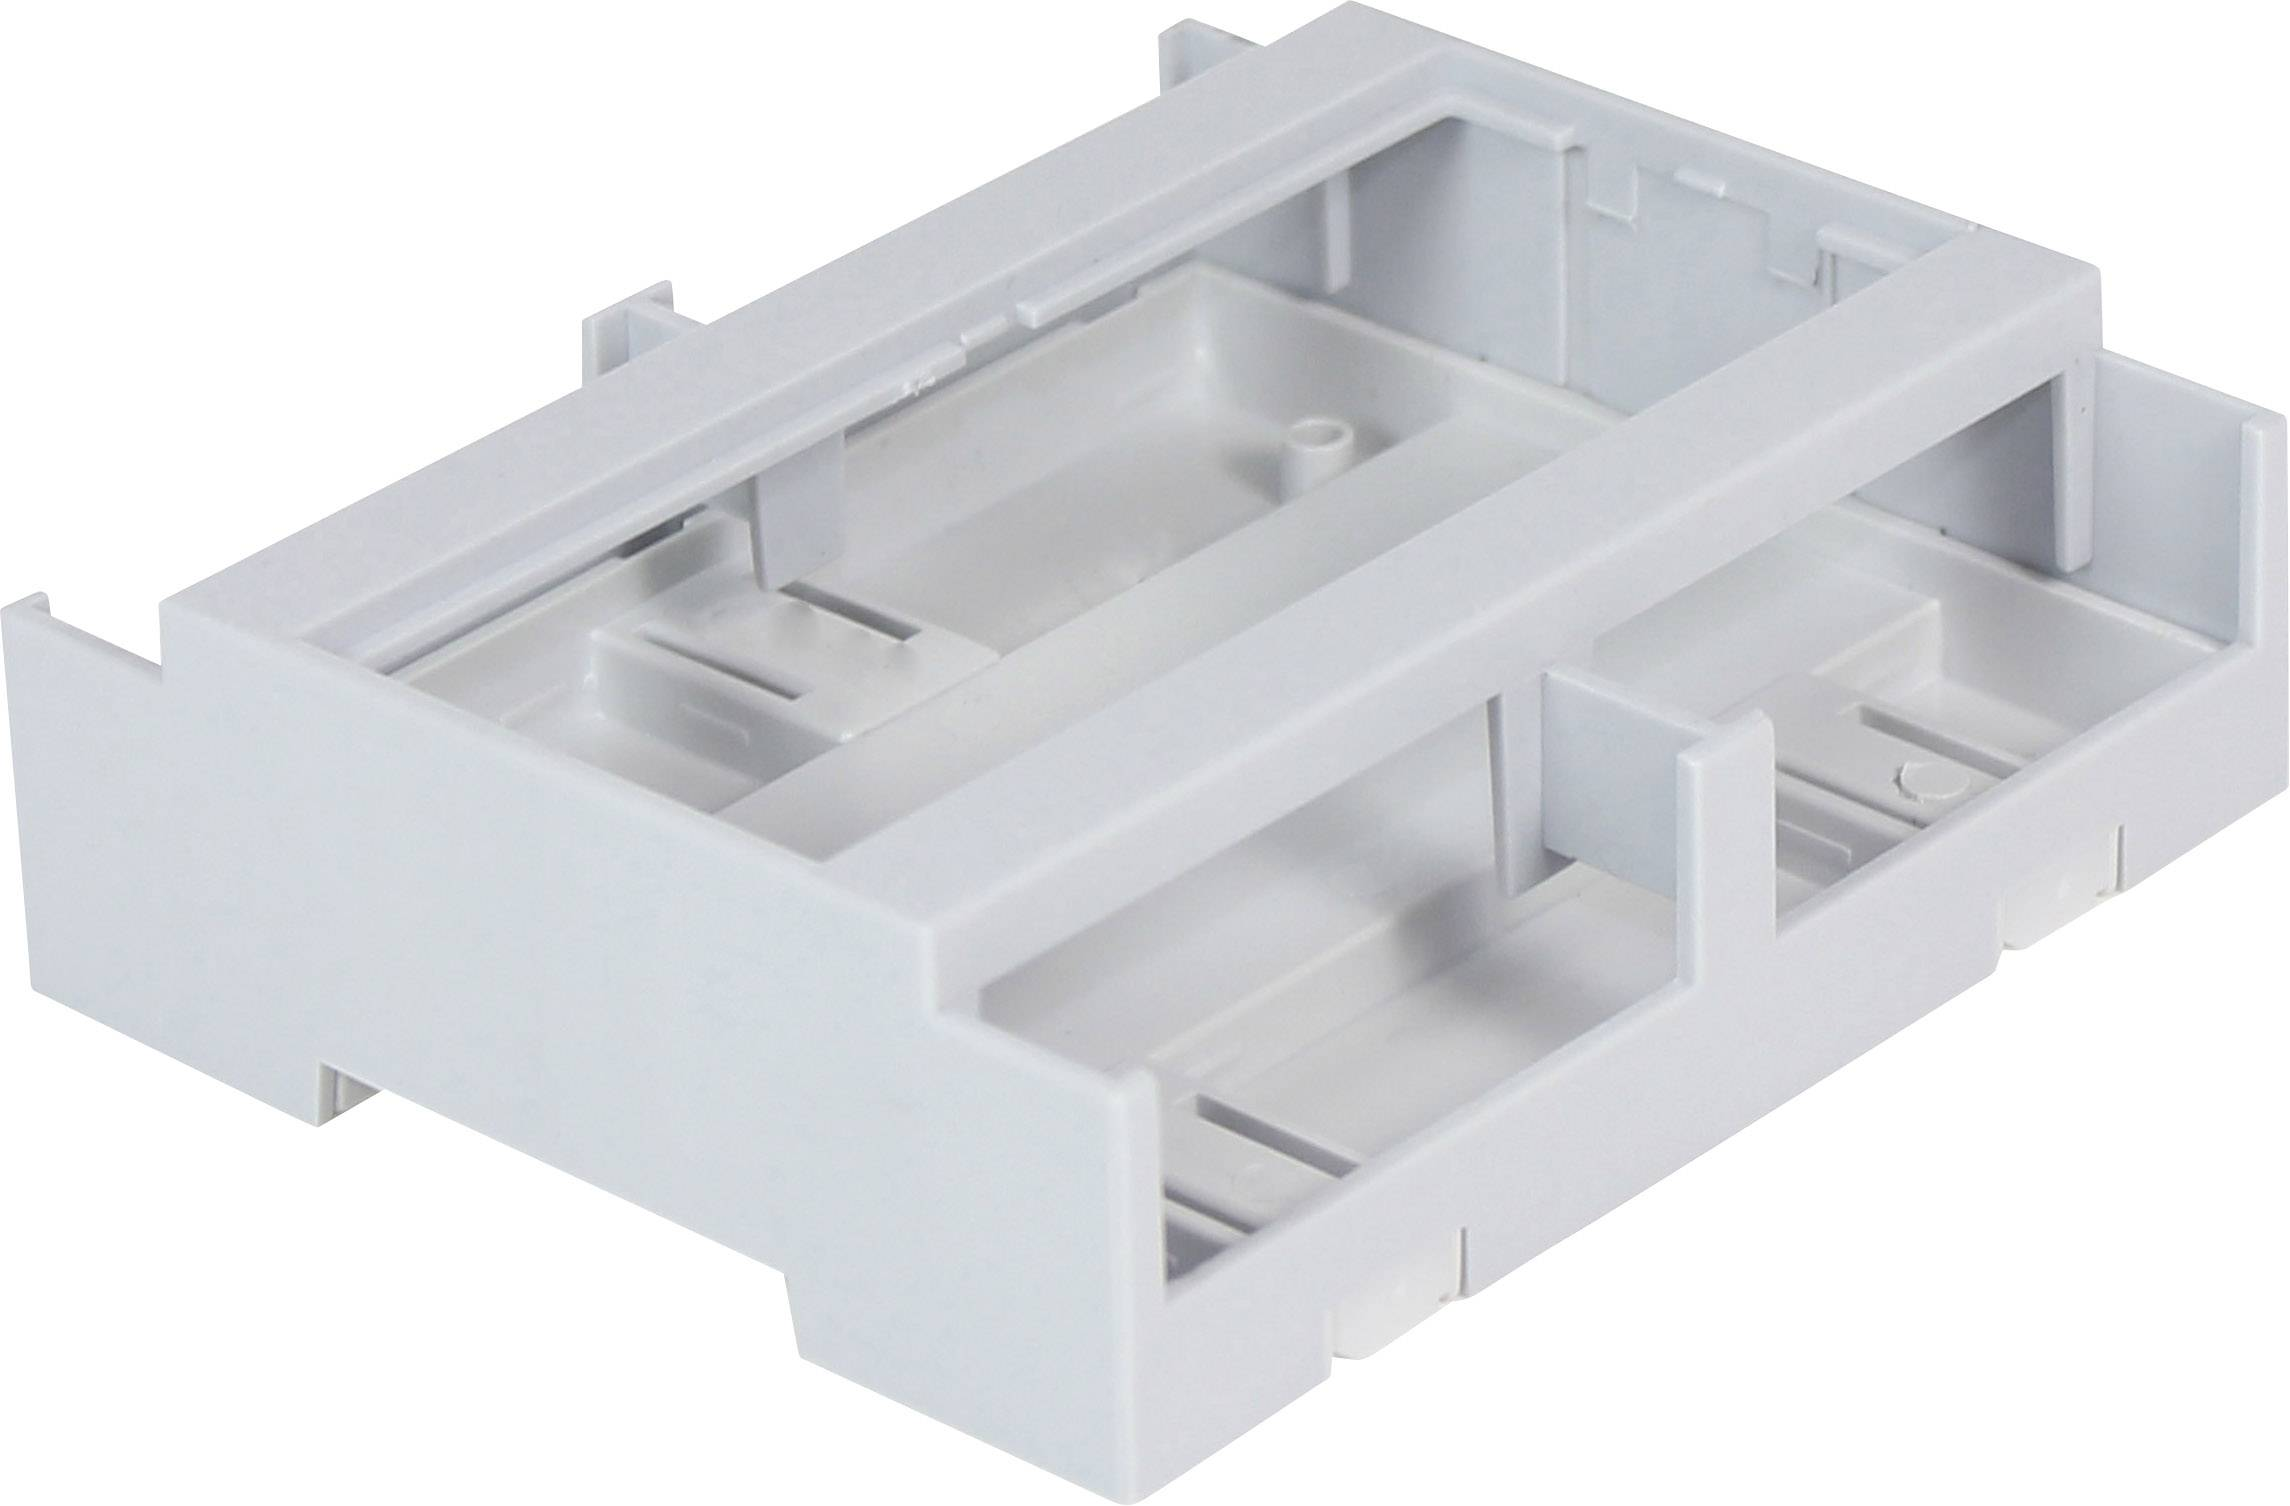 Pouzdro na DIN lištu Axxatronic CDIB/6/L2-KIT-CON 106.2 x 100 x 31.9 , polykarbonát, šedá, 1 ks